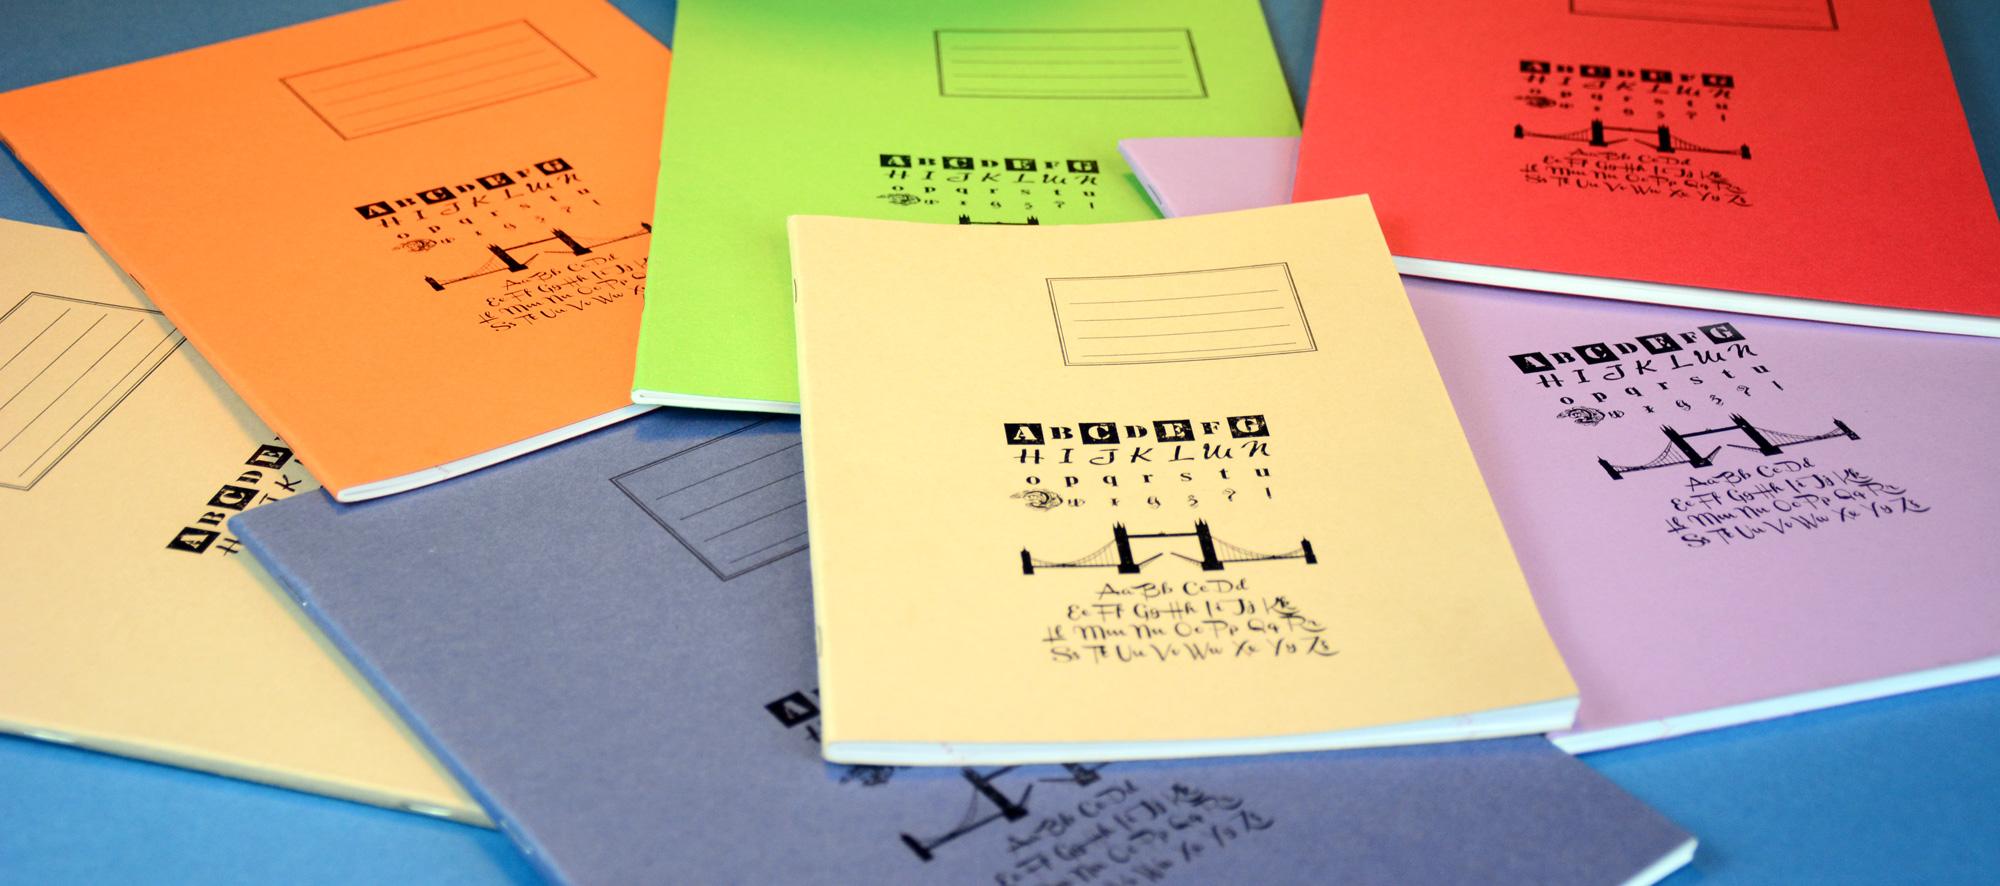 Notes Overprint